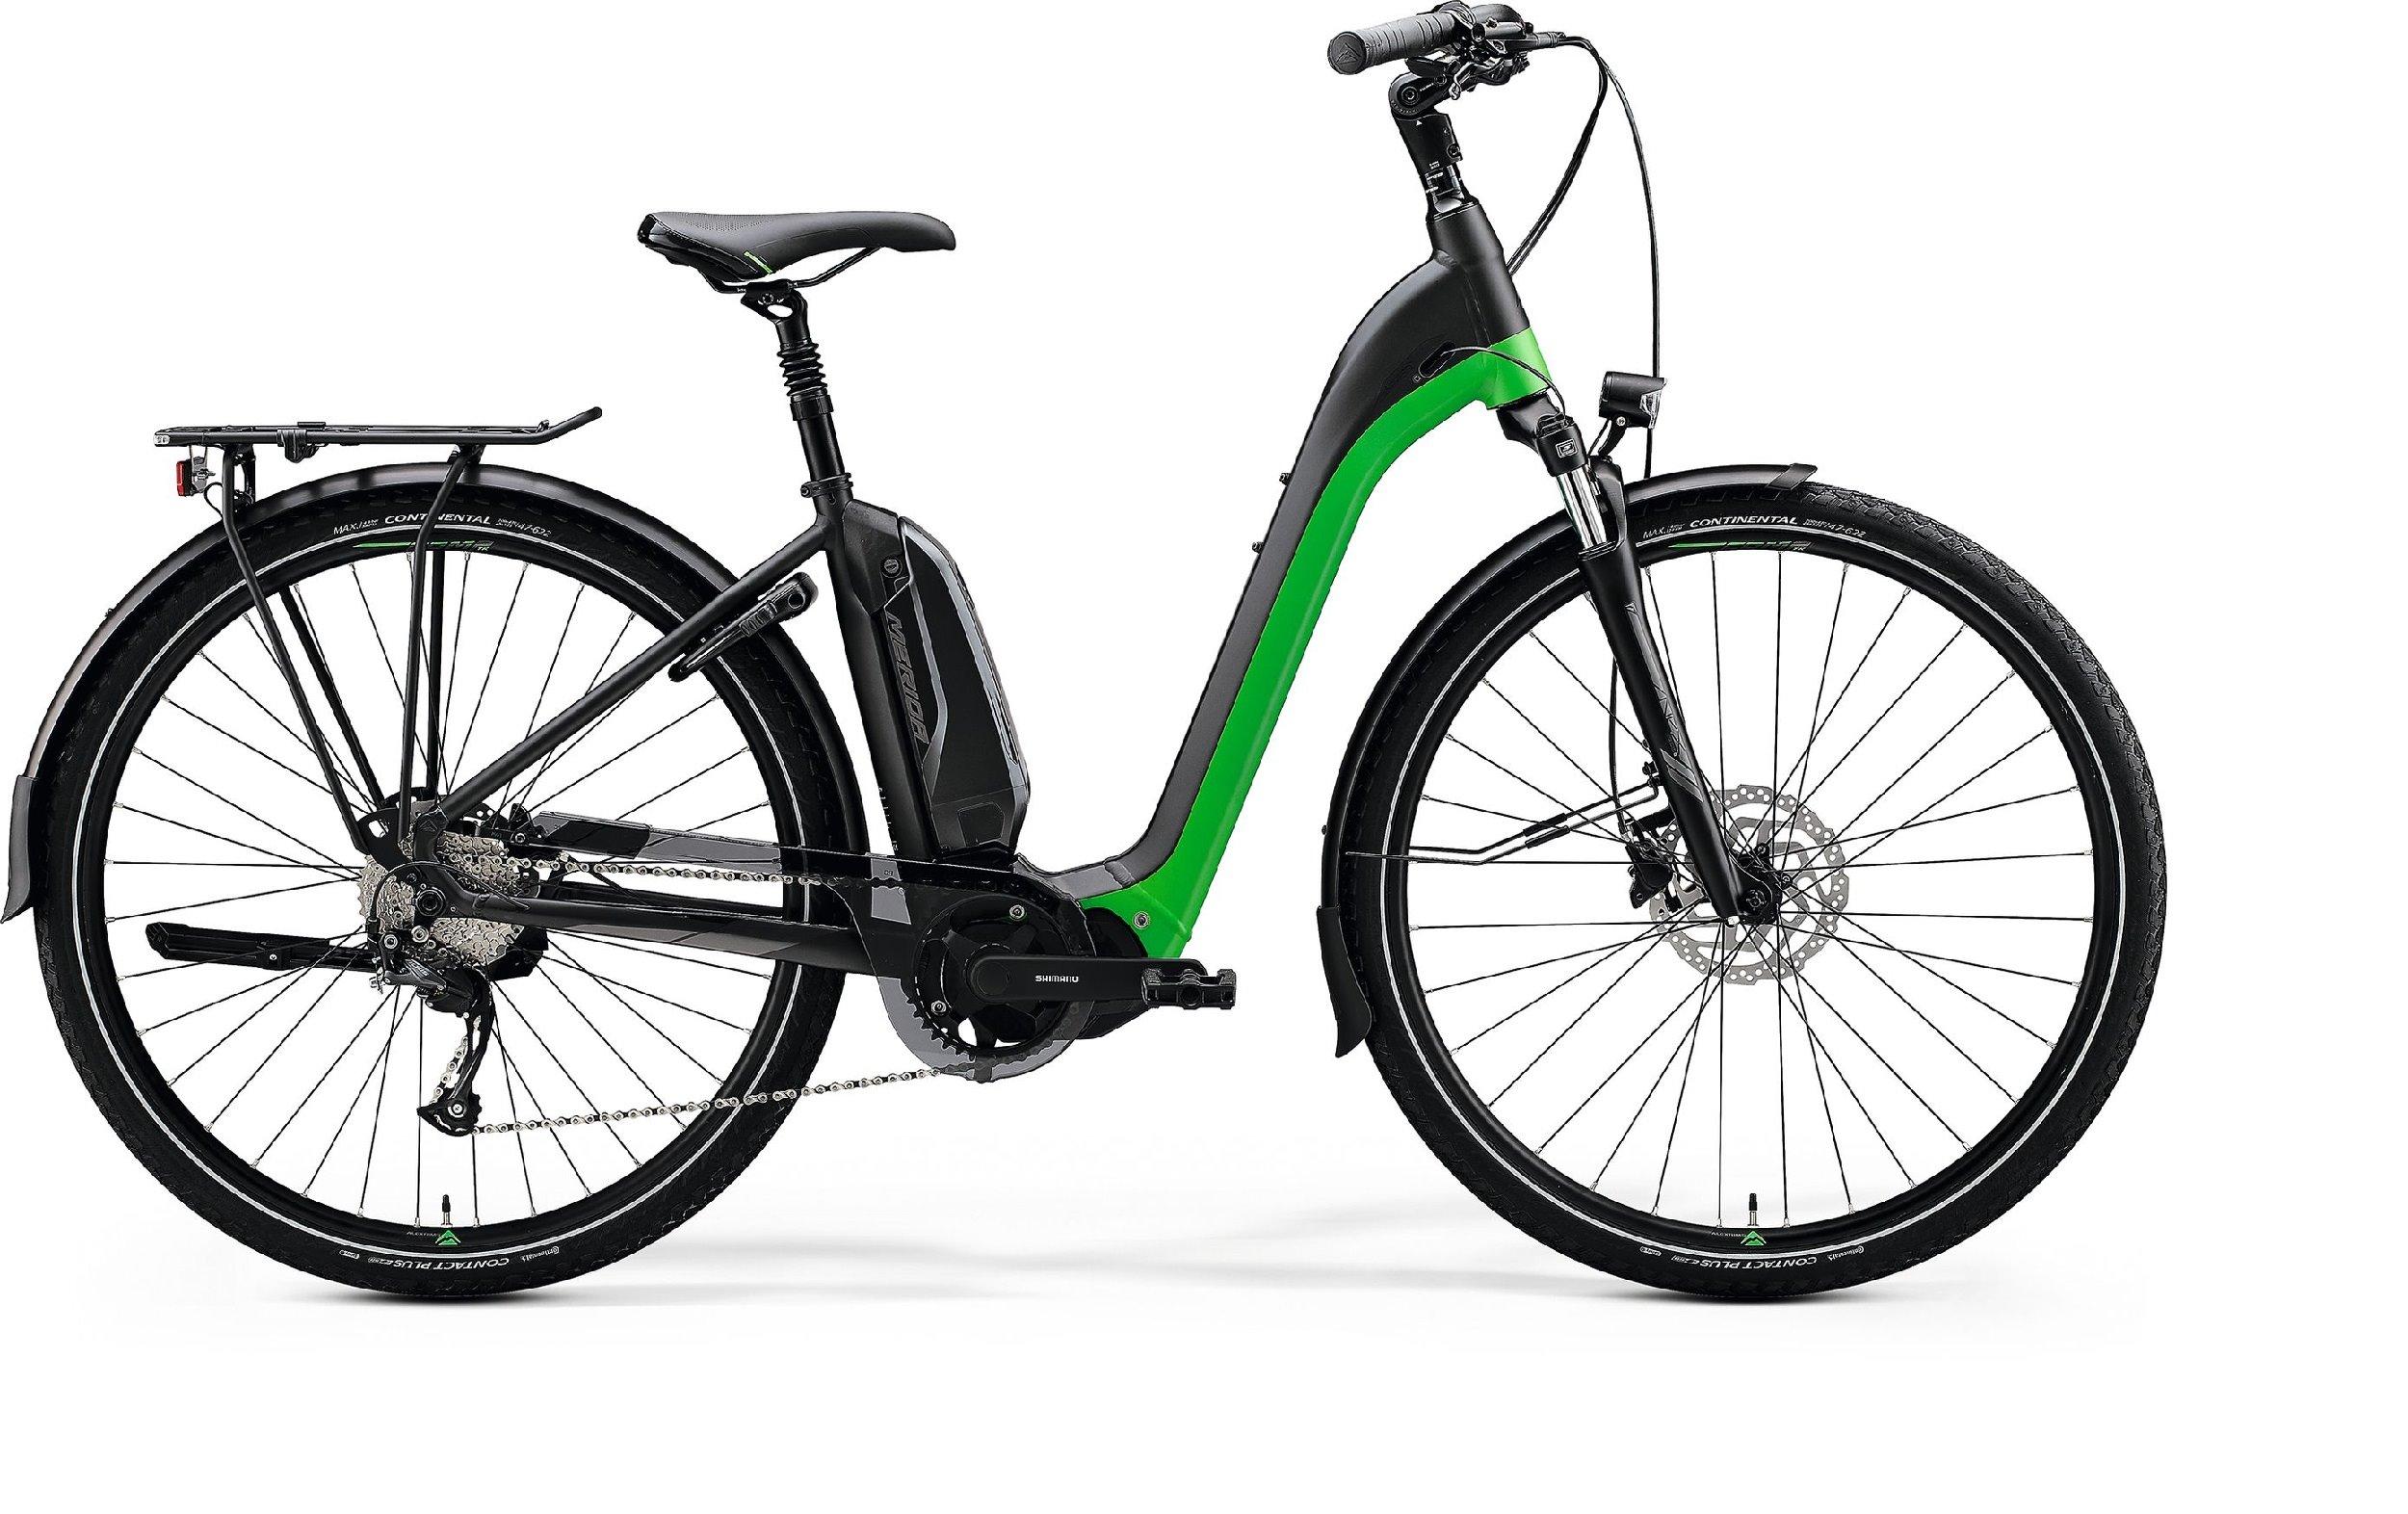 Merida eSPRESSO CITY 200 EQ černé/zelené (180-190 cm)